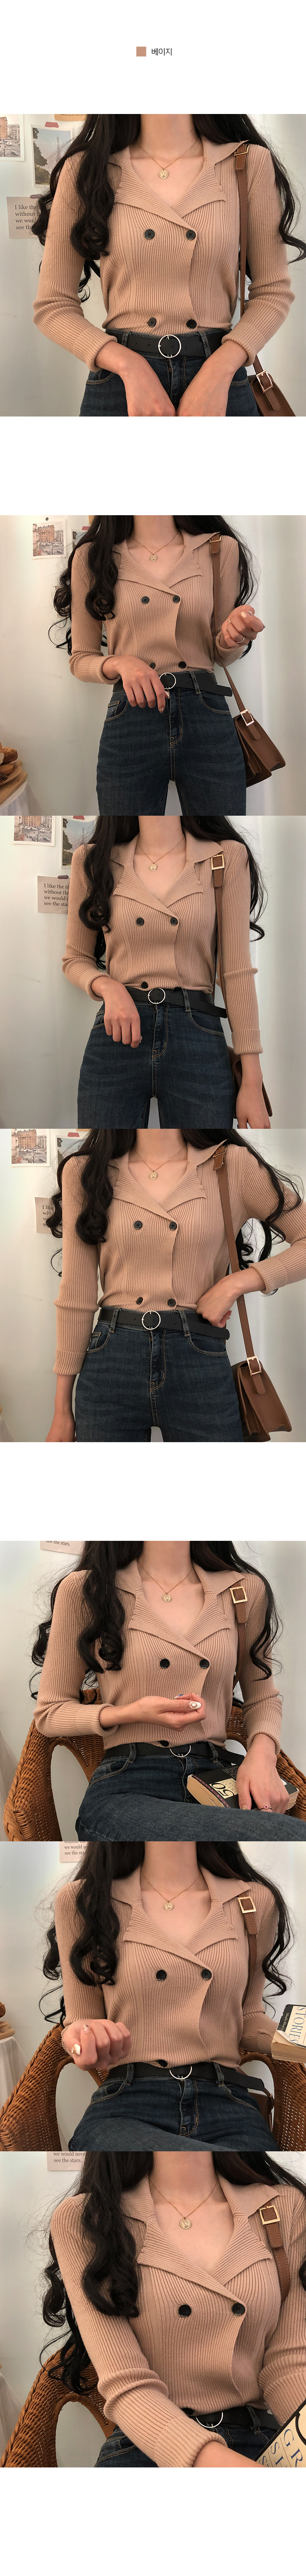 Bene double button collar knit